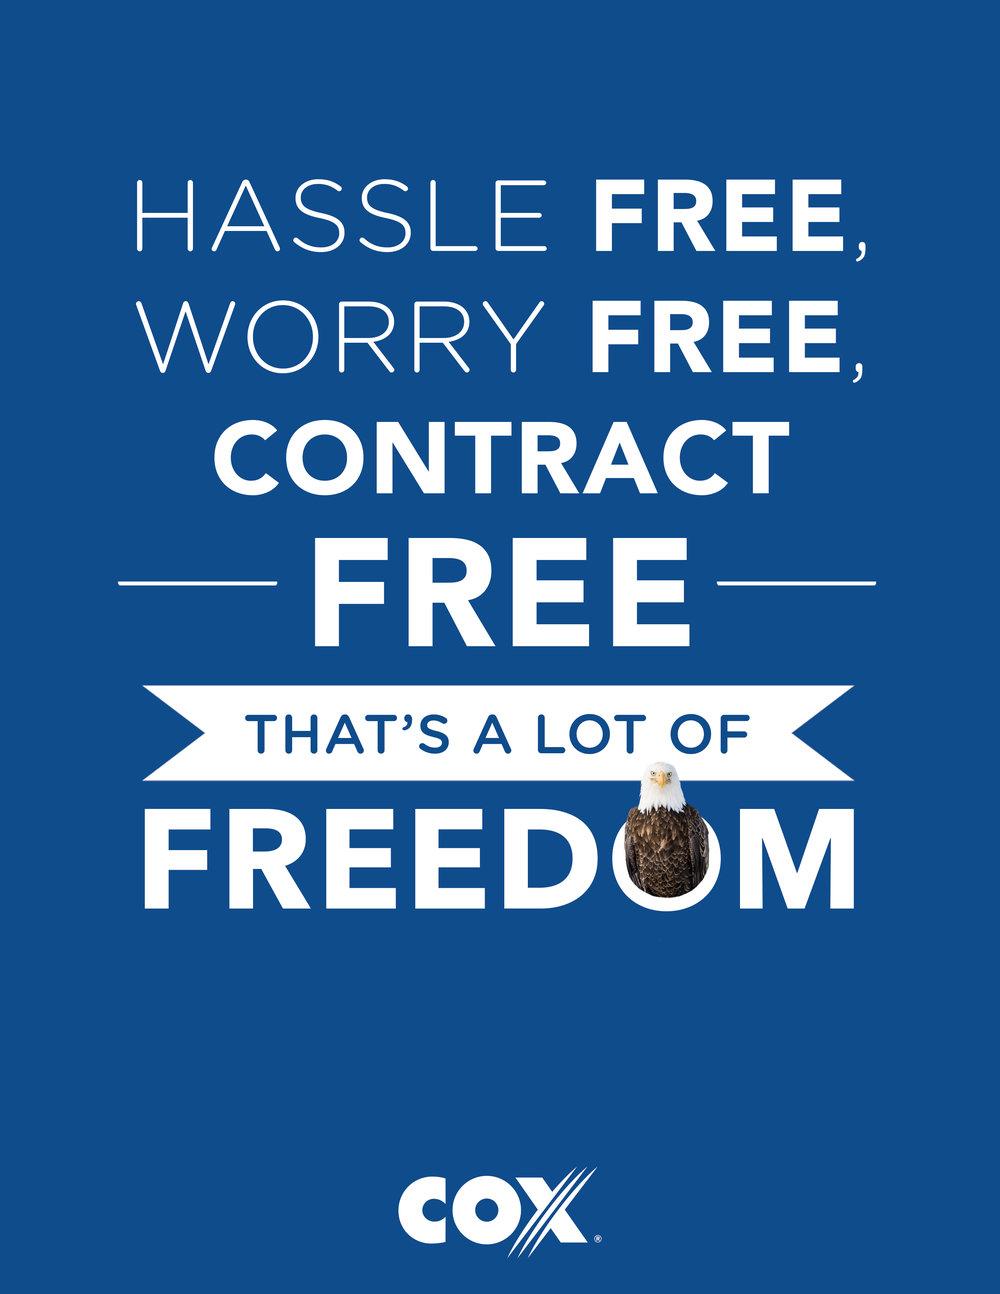 Freedom_PrintAd.jpg